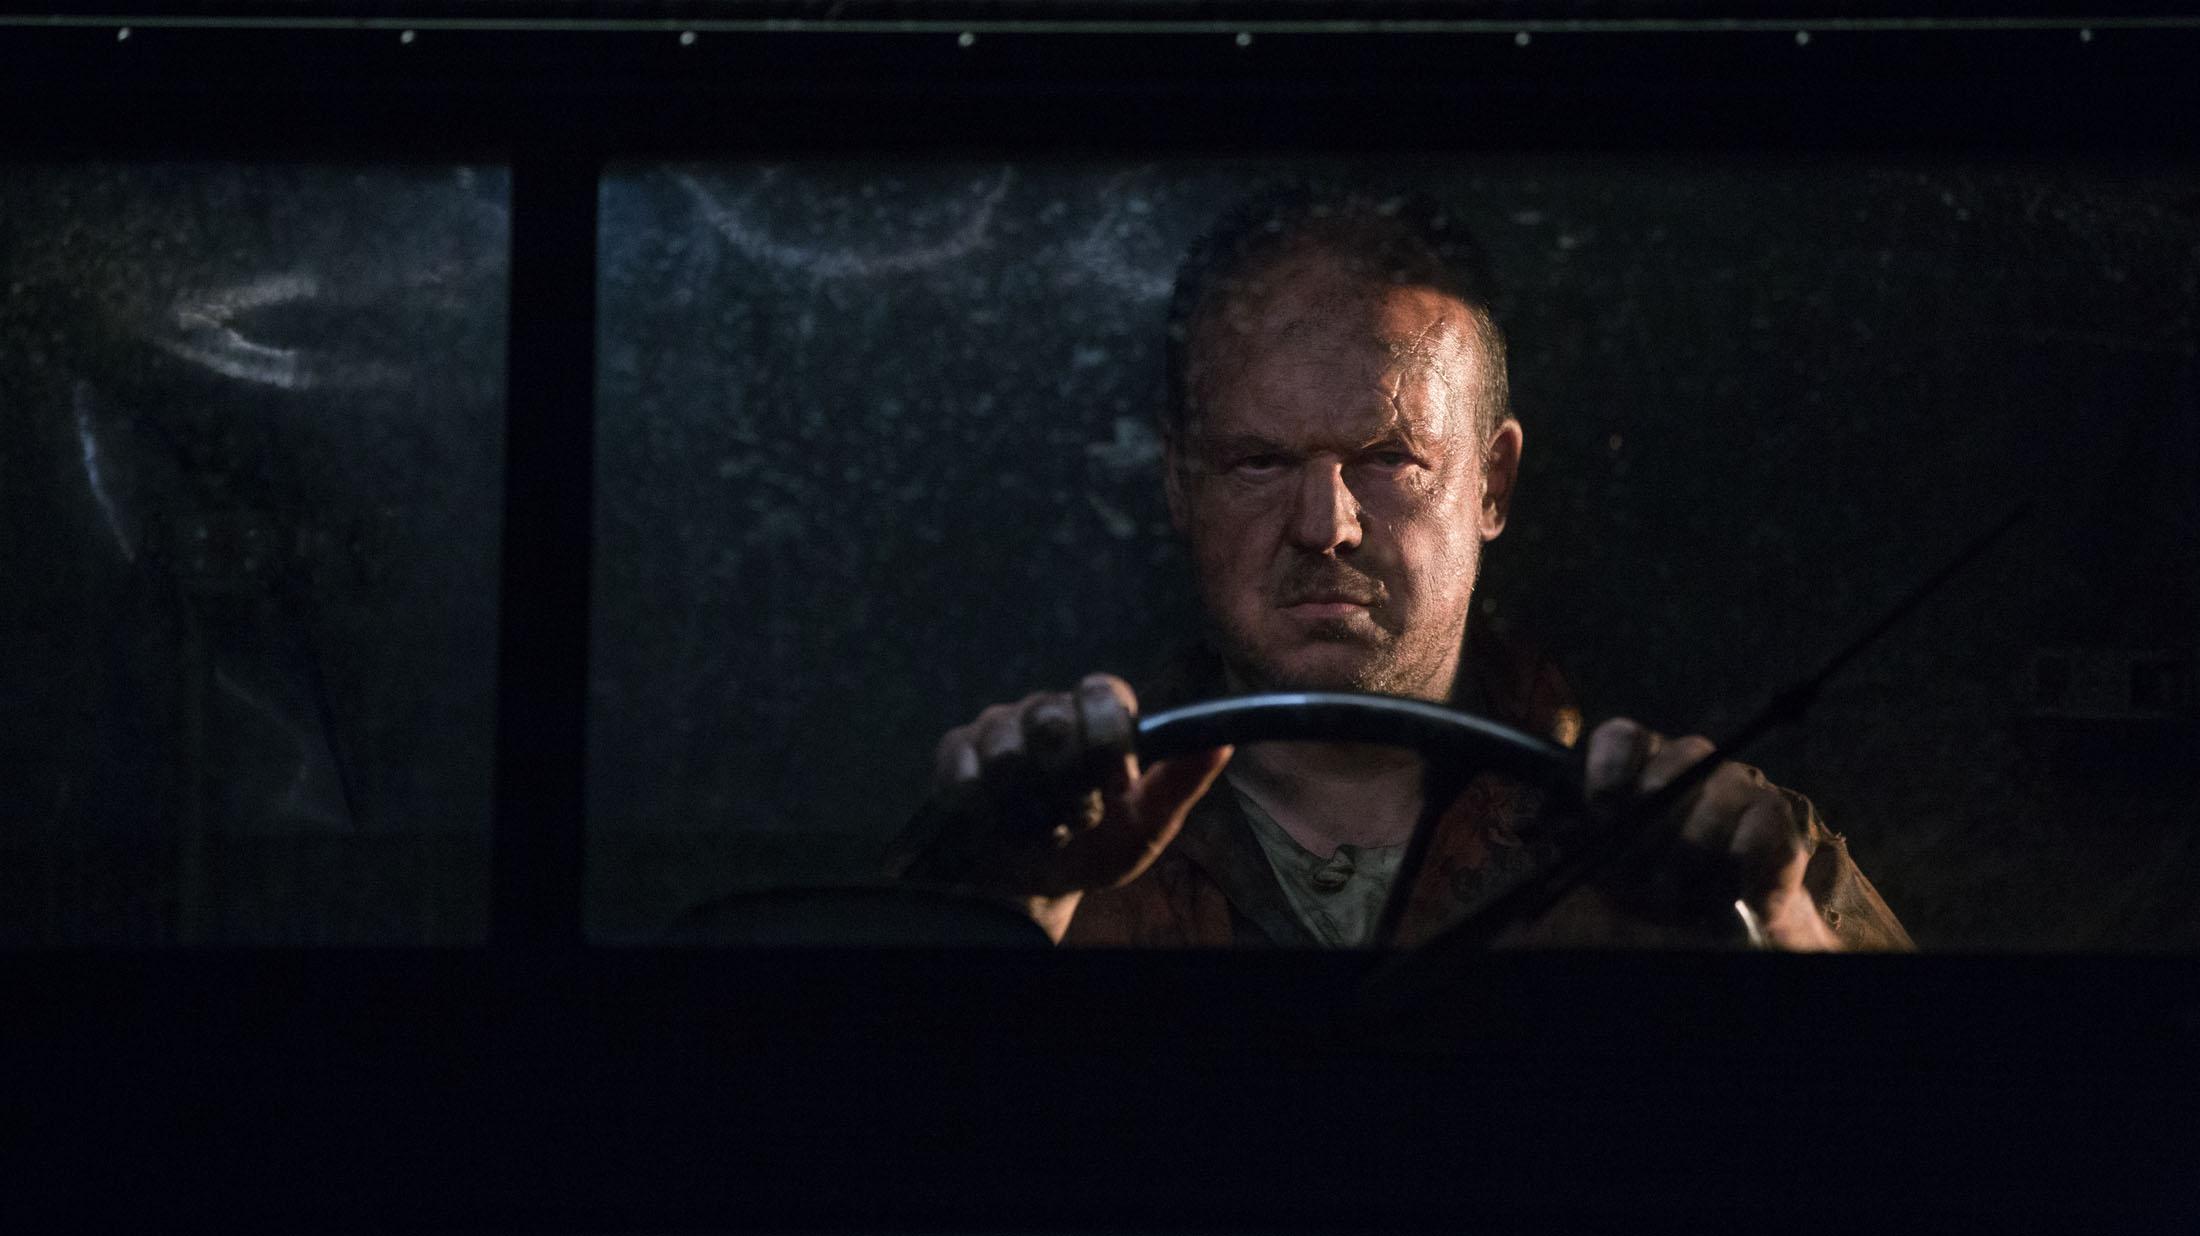 Jan Hammenecker in CUB directed by Jonas Govaerts - DoP Nicolas Karakatsanis. Courtesy Potemkino